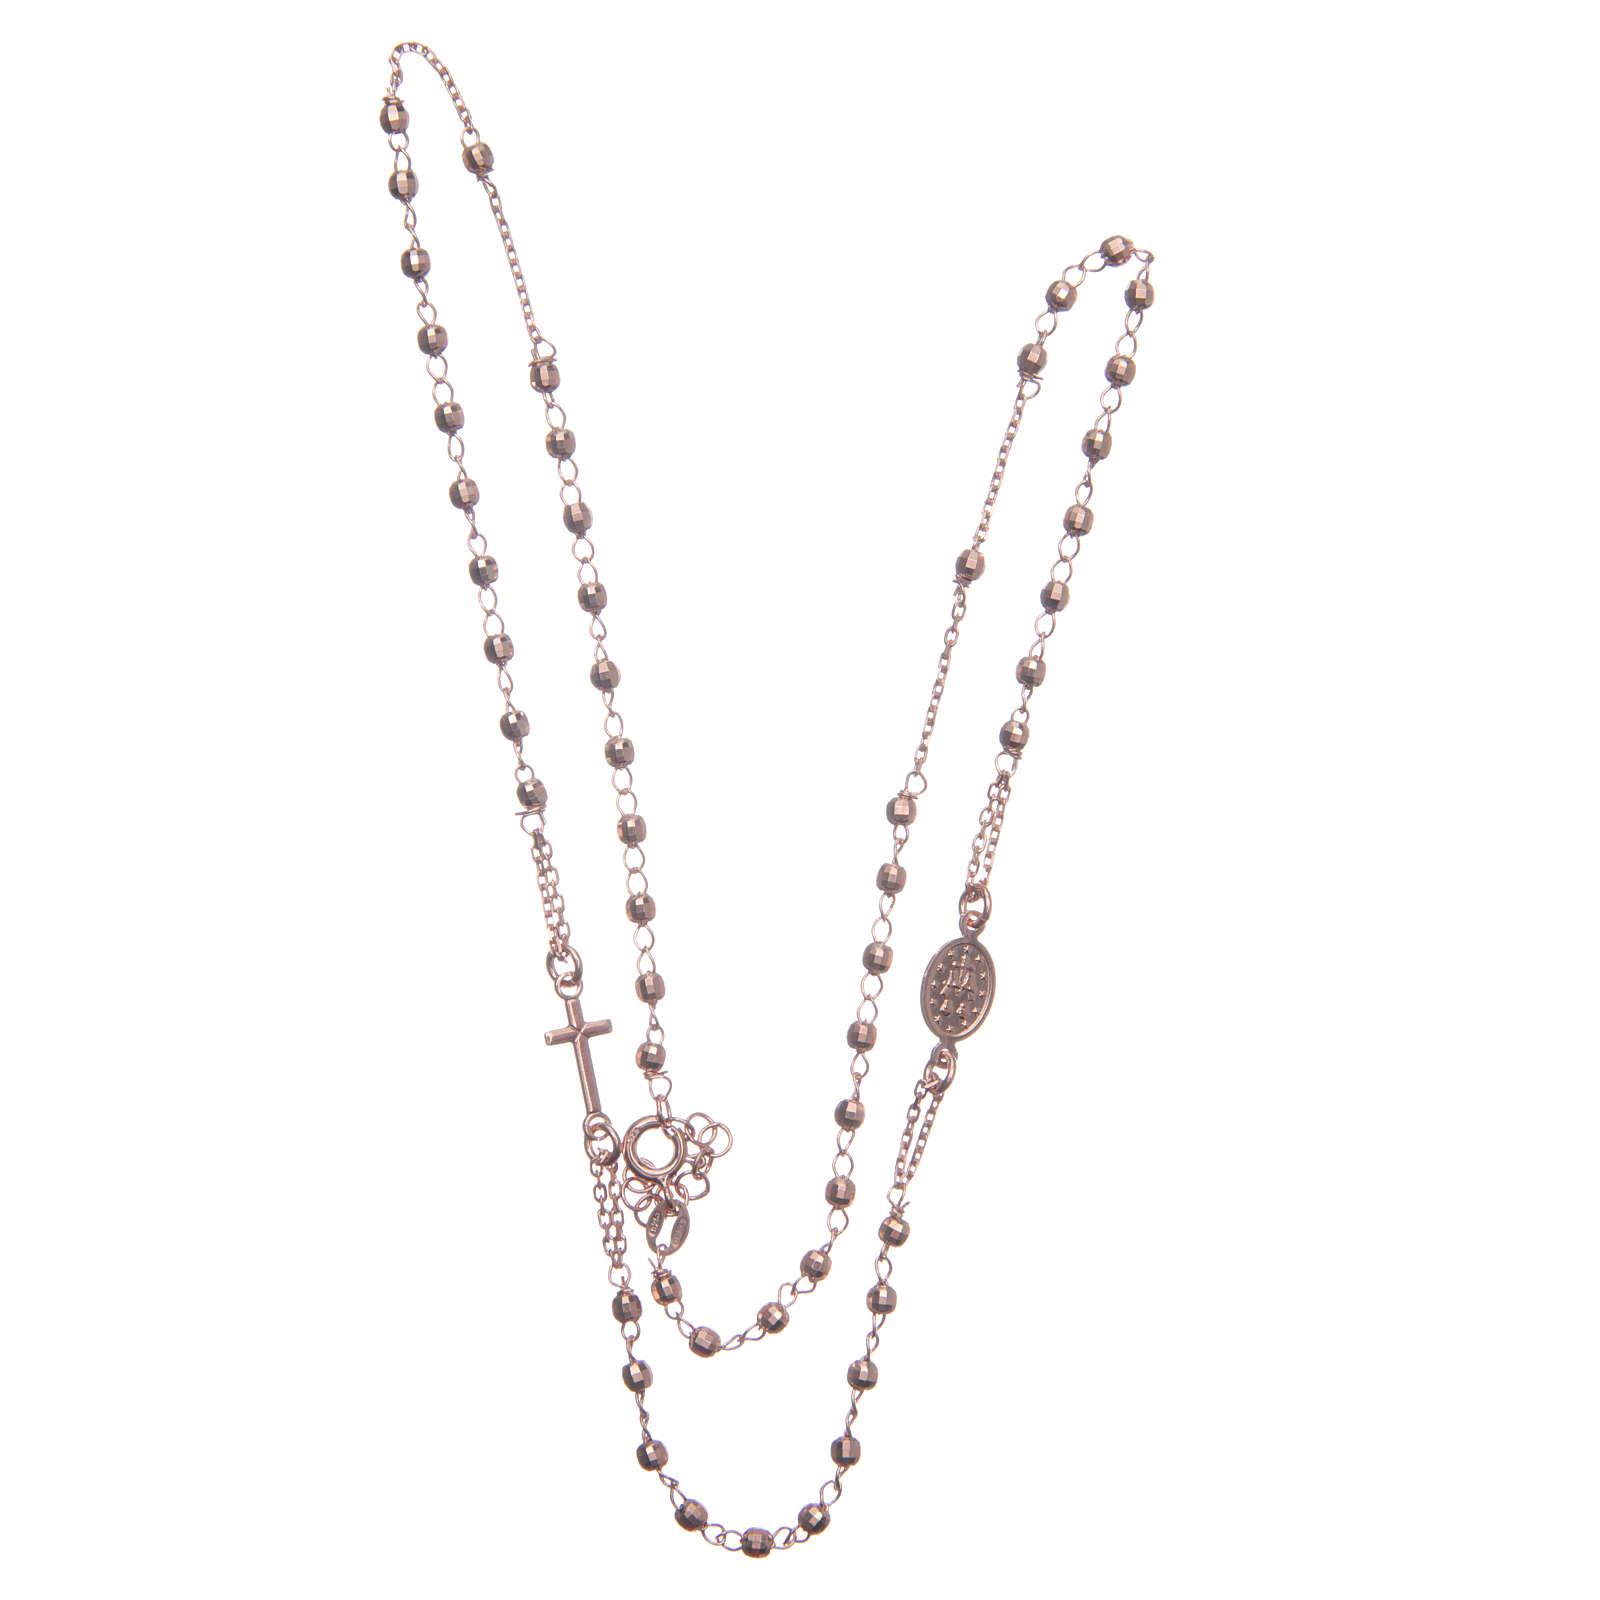 Rosario girocollo colore rosé argento 925 4